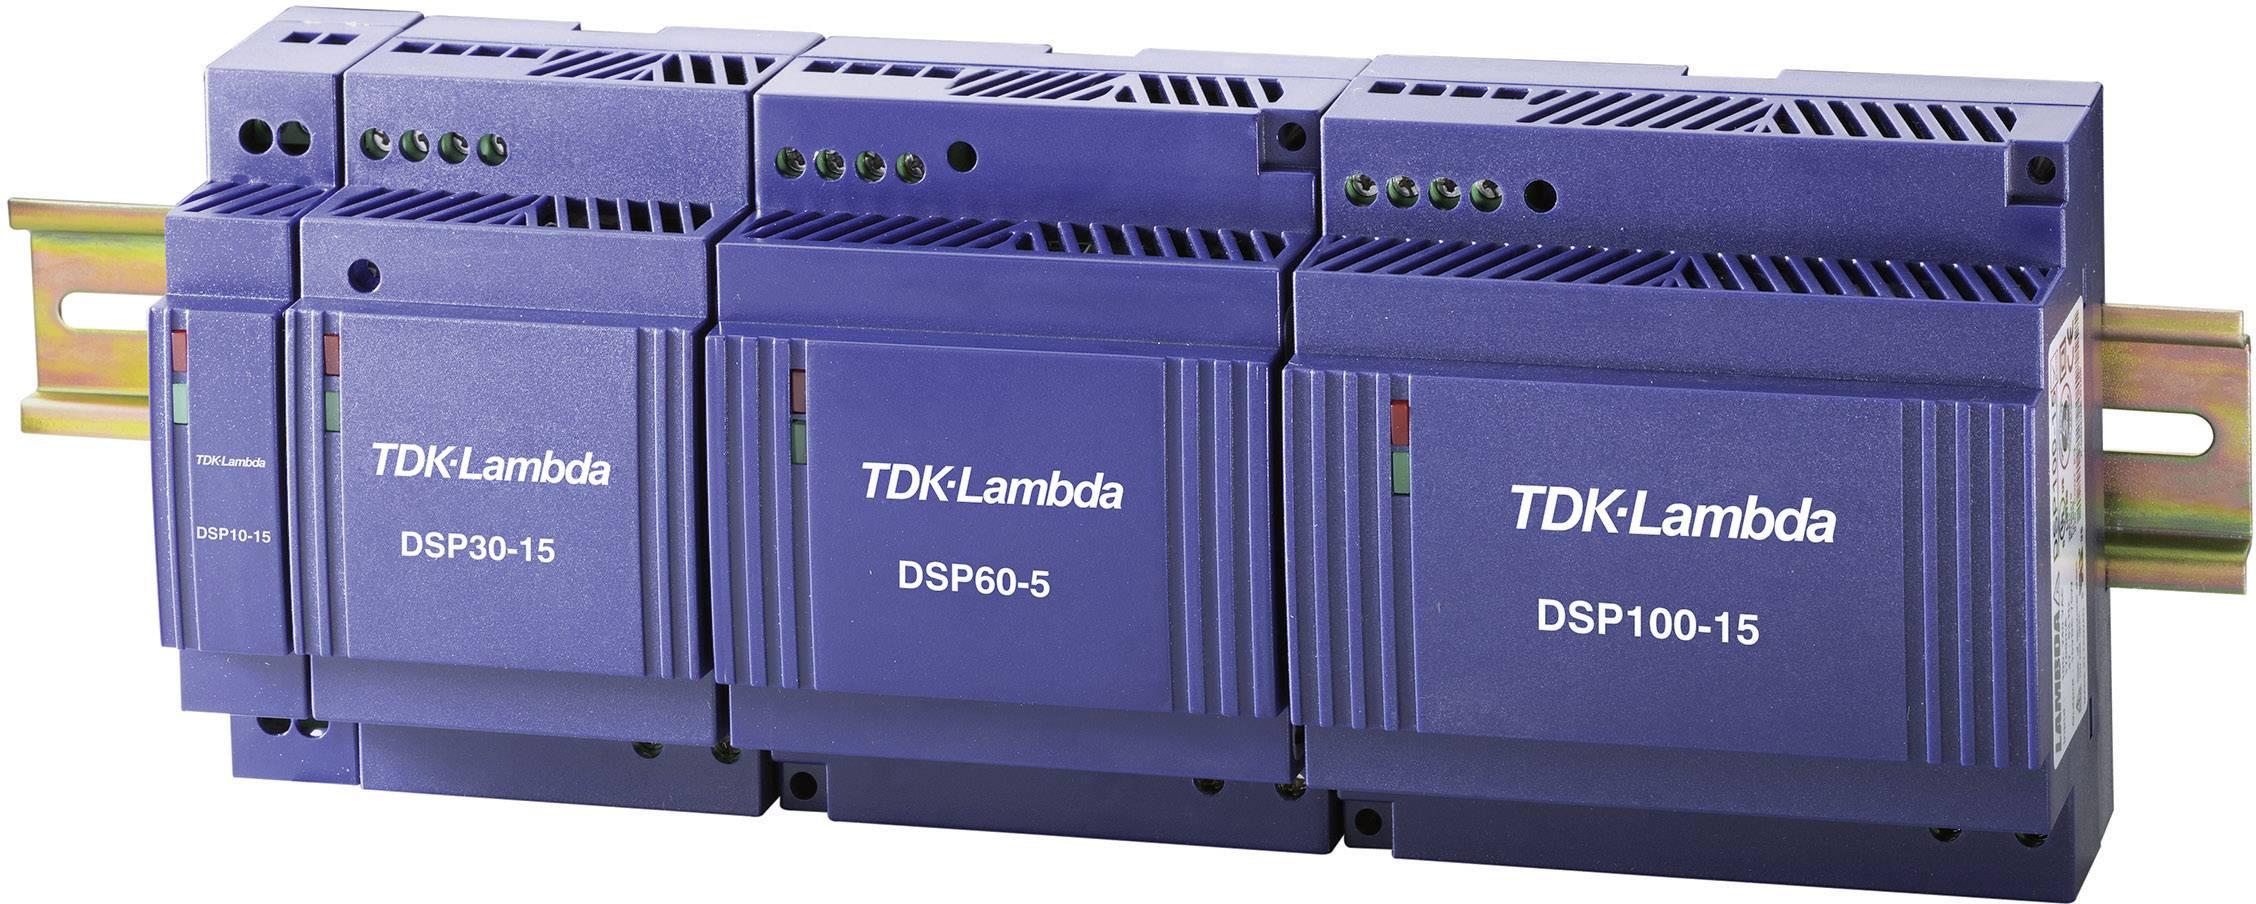 Sieťový zdroj na montážnu lištu (DIN lištu) TDK-Lambda DSP-10-15, 1 x, 15 V/DC, 0.67 A, 10 W